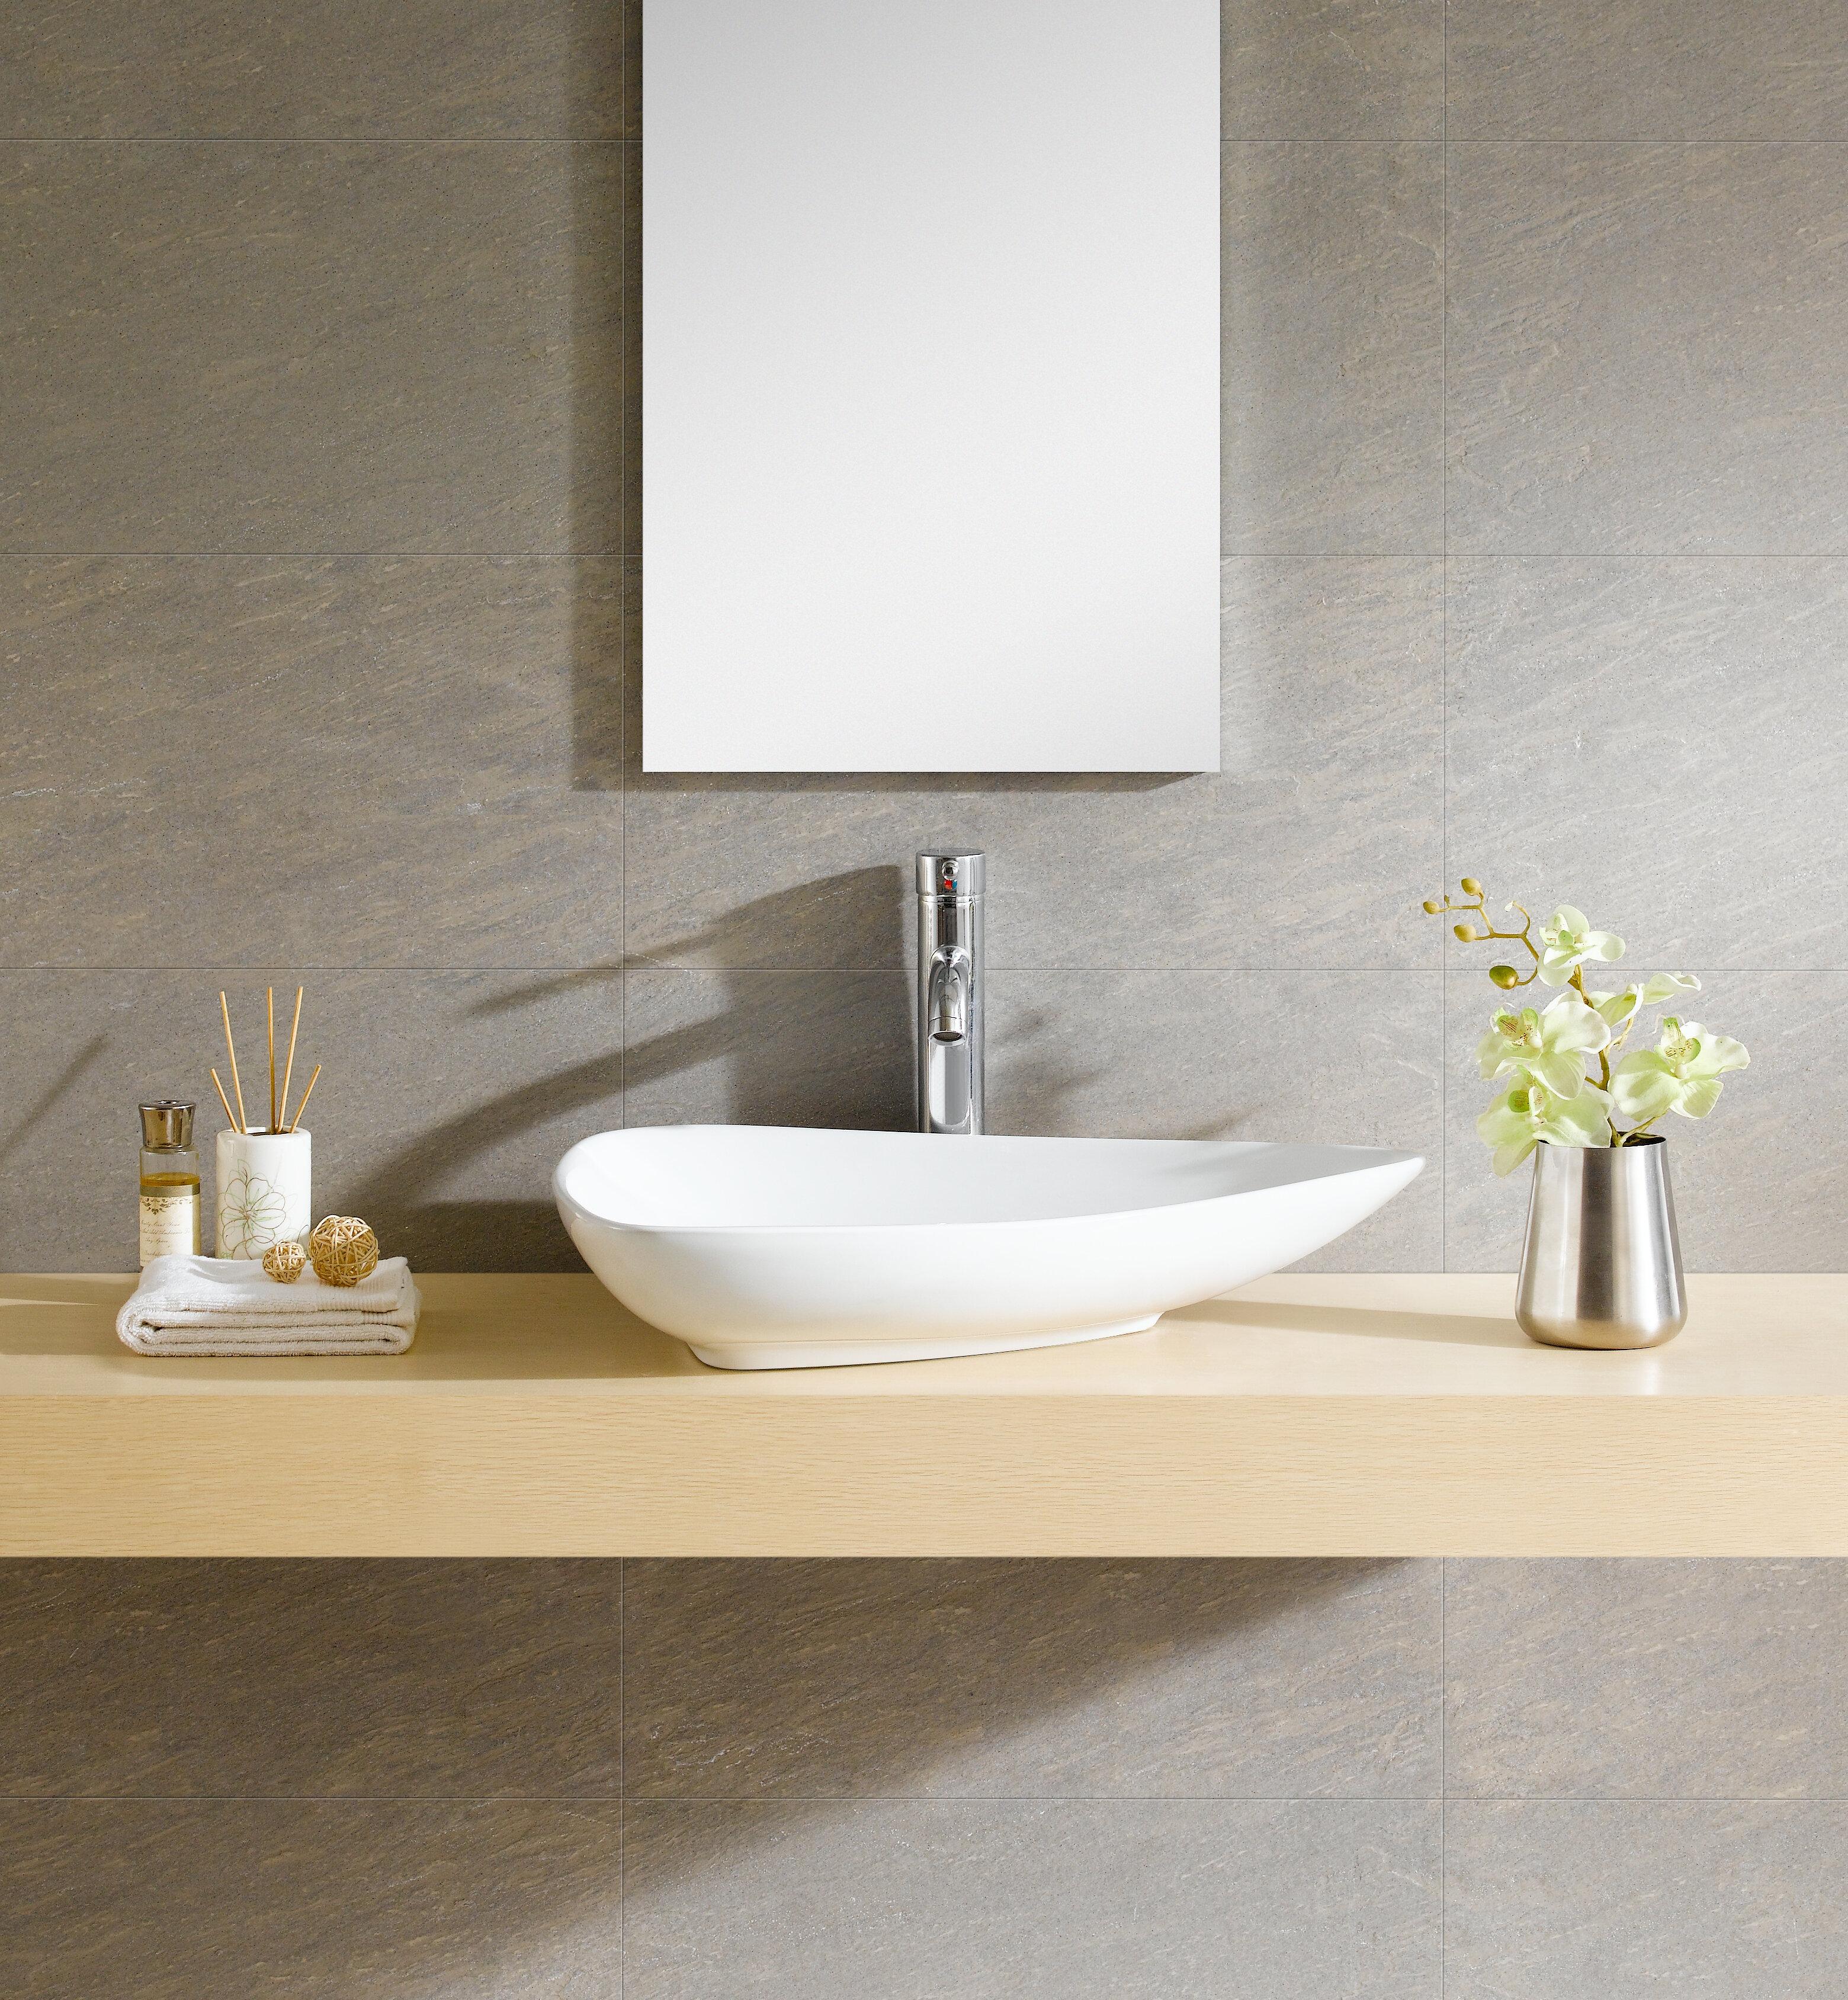 Incredible Modern Ceramic Specialty Vessel Bathroom Sink Interior Design Ideas Gentotryabchikinfo